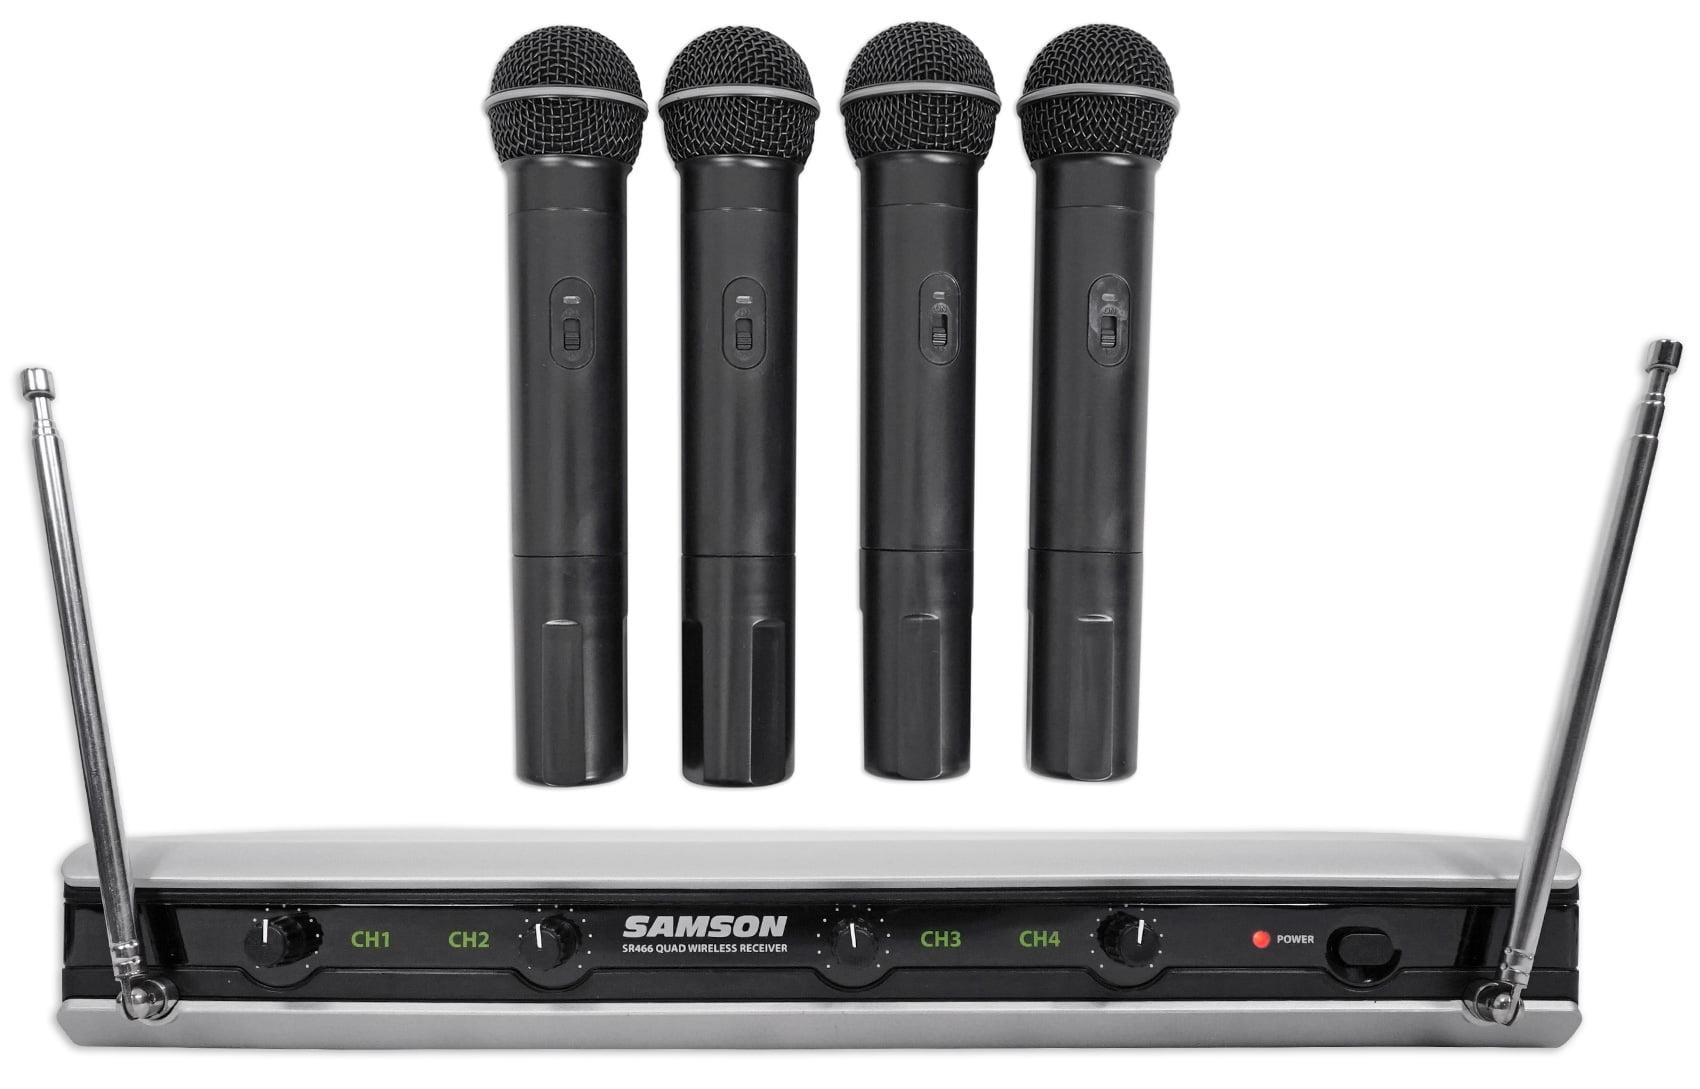 Samson Stage v466 Quad (4) Handheld Karaoke Wireless Microphones Mic System by Samson